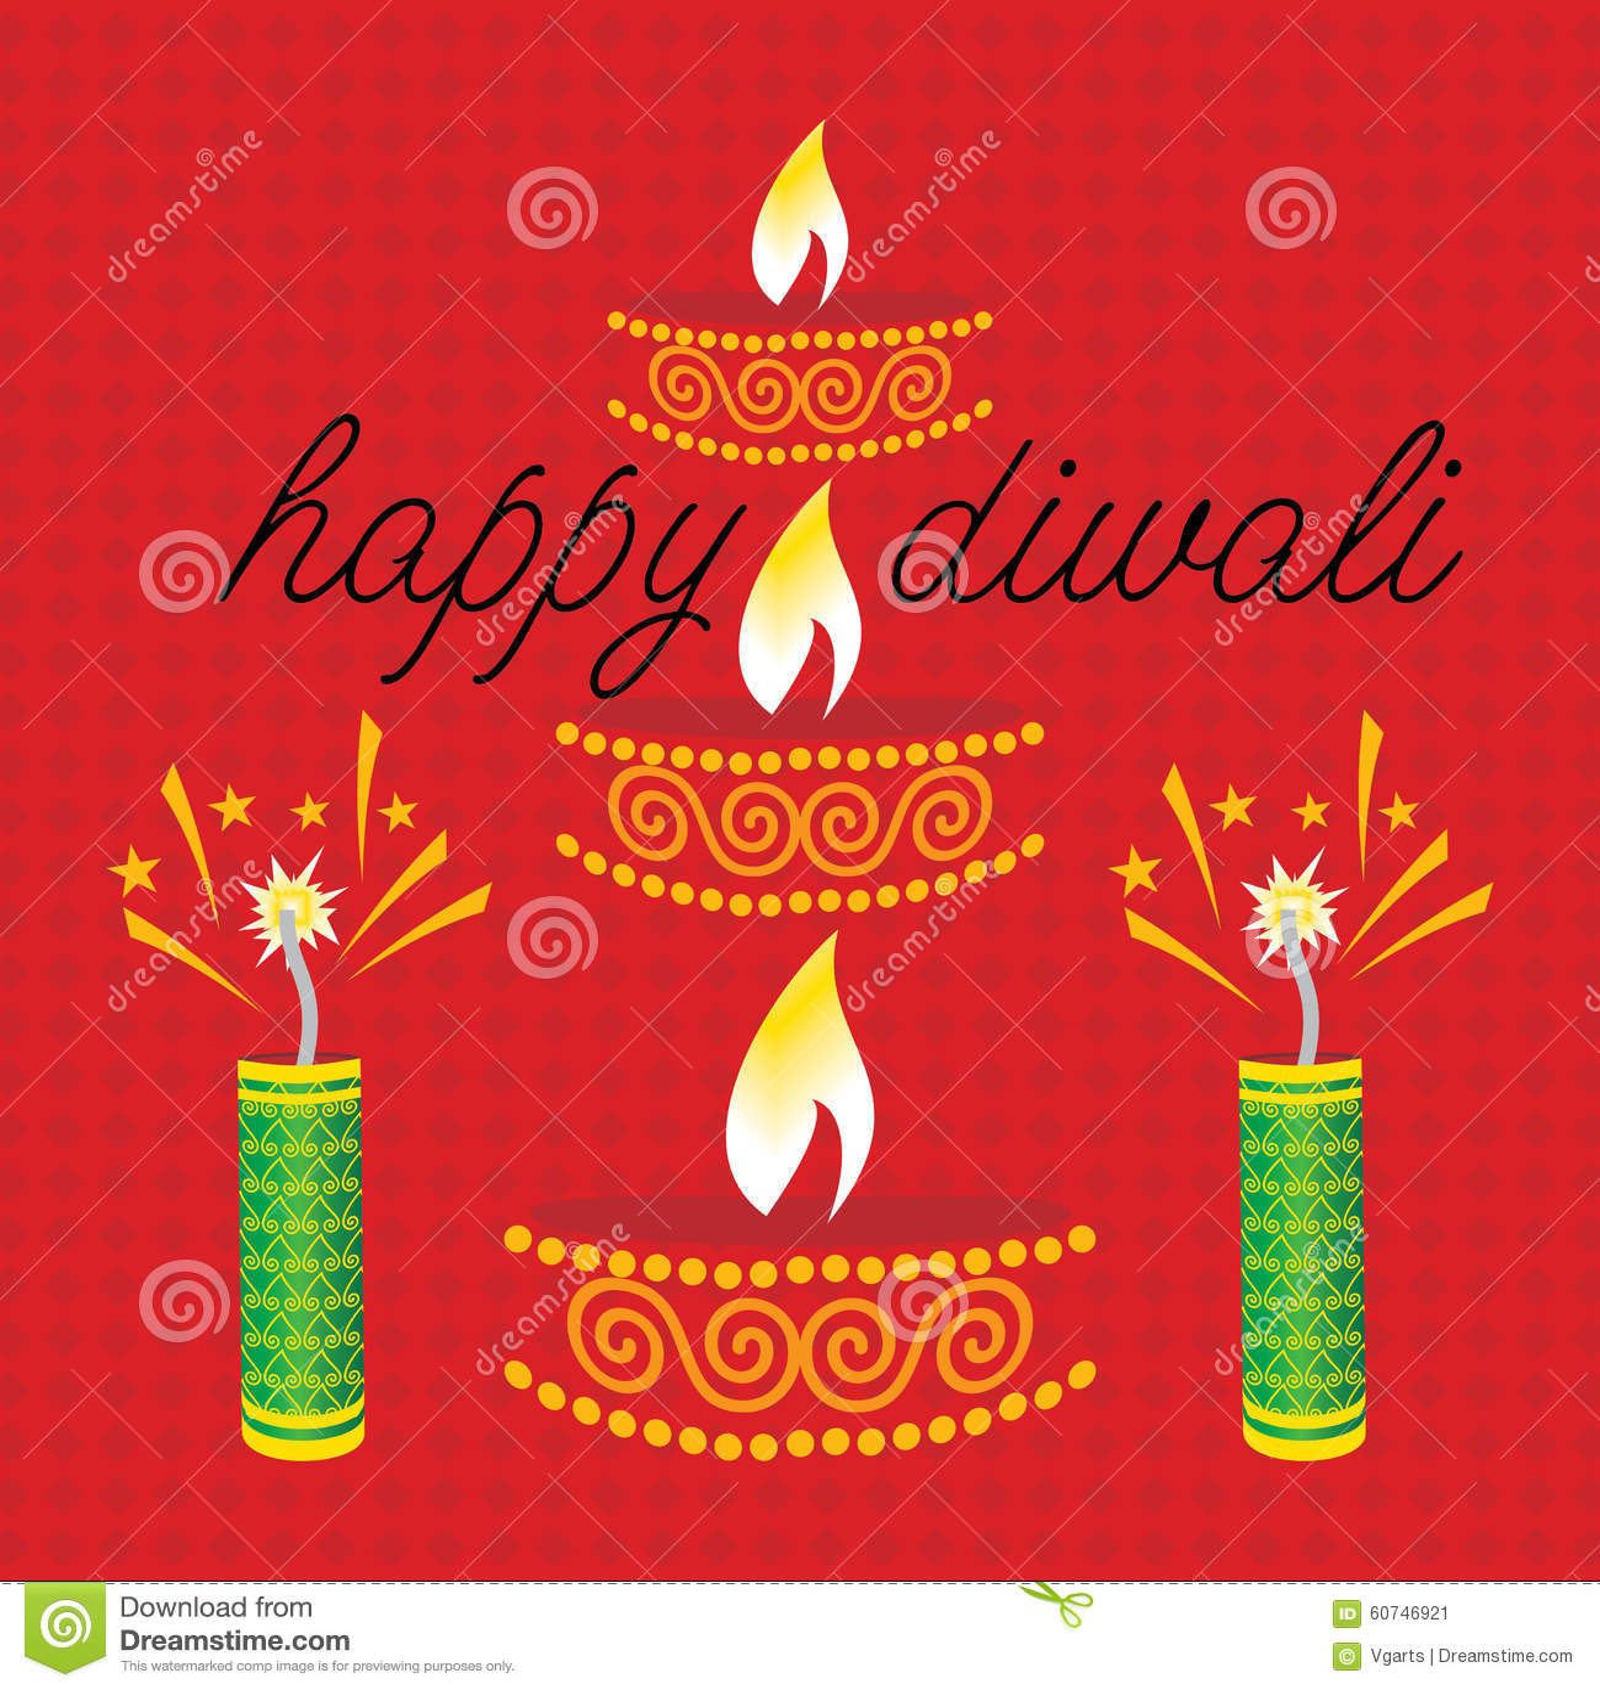 Diwali Concept Stock Vector Illustration Of Cracker 60746921